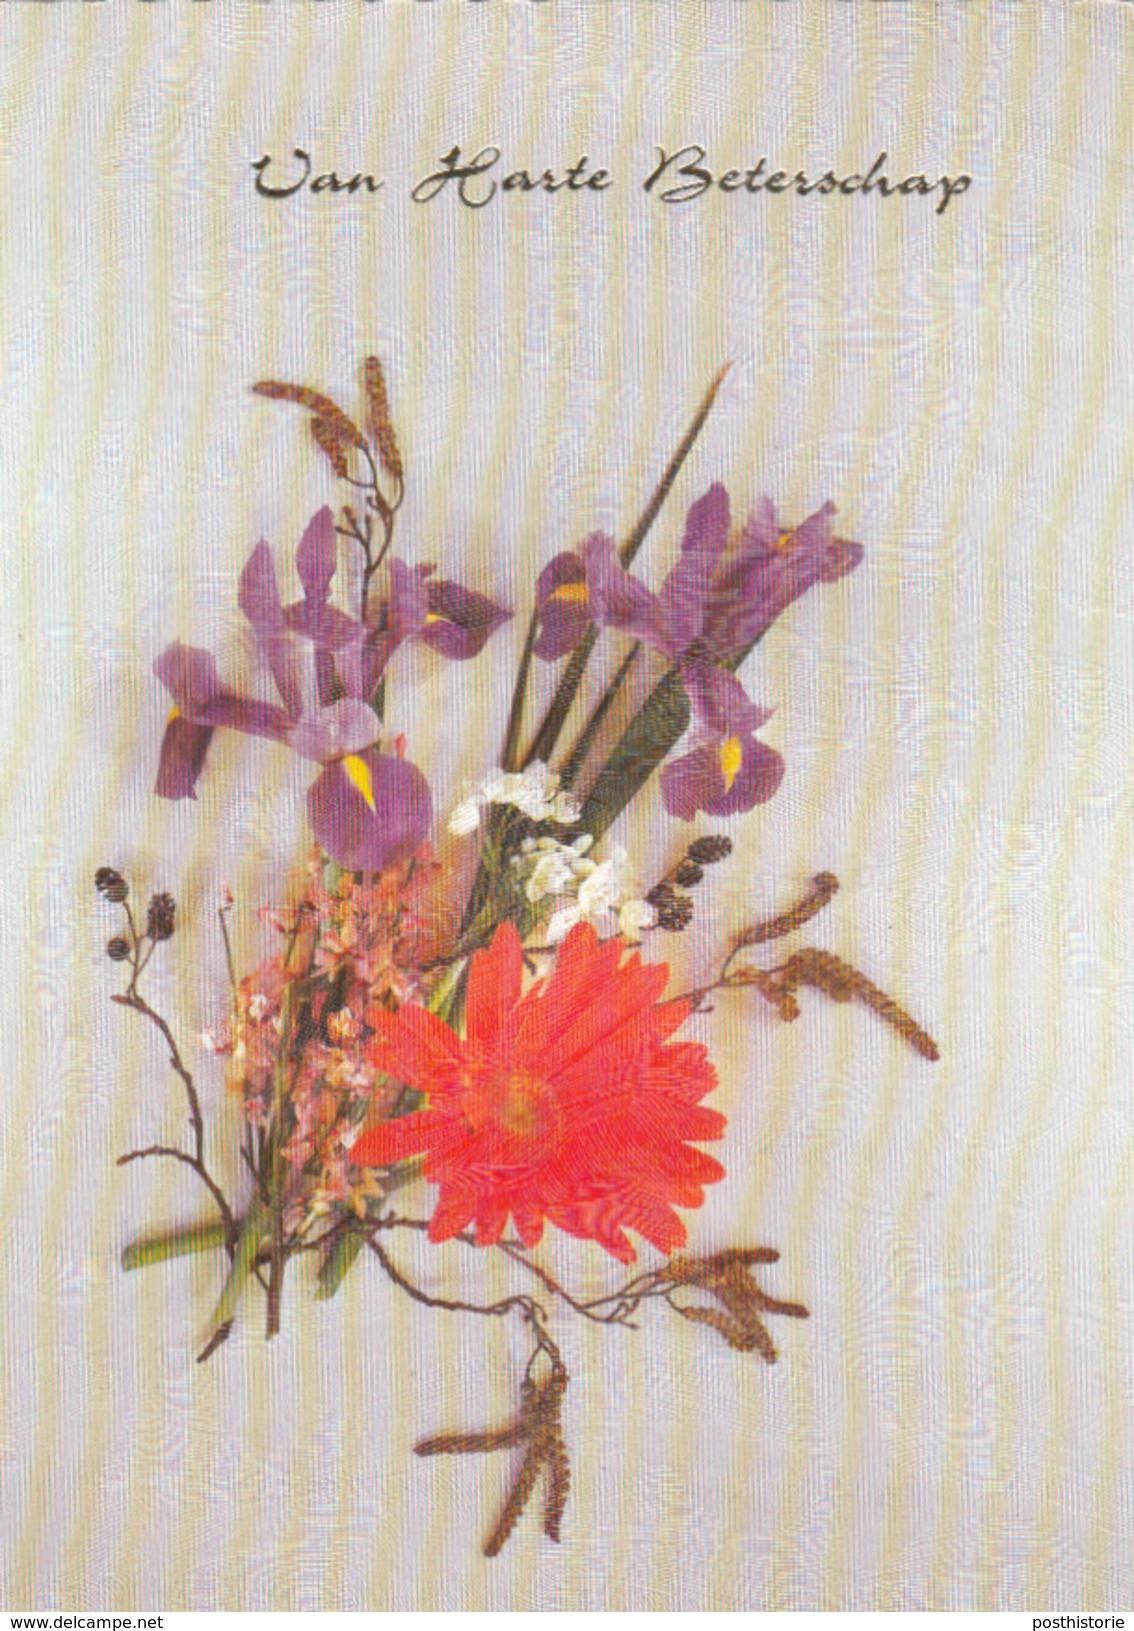 Ansicht 8 Feb 1982 Loppersum (stempeltype Openbalk) - Postal History